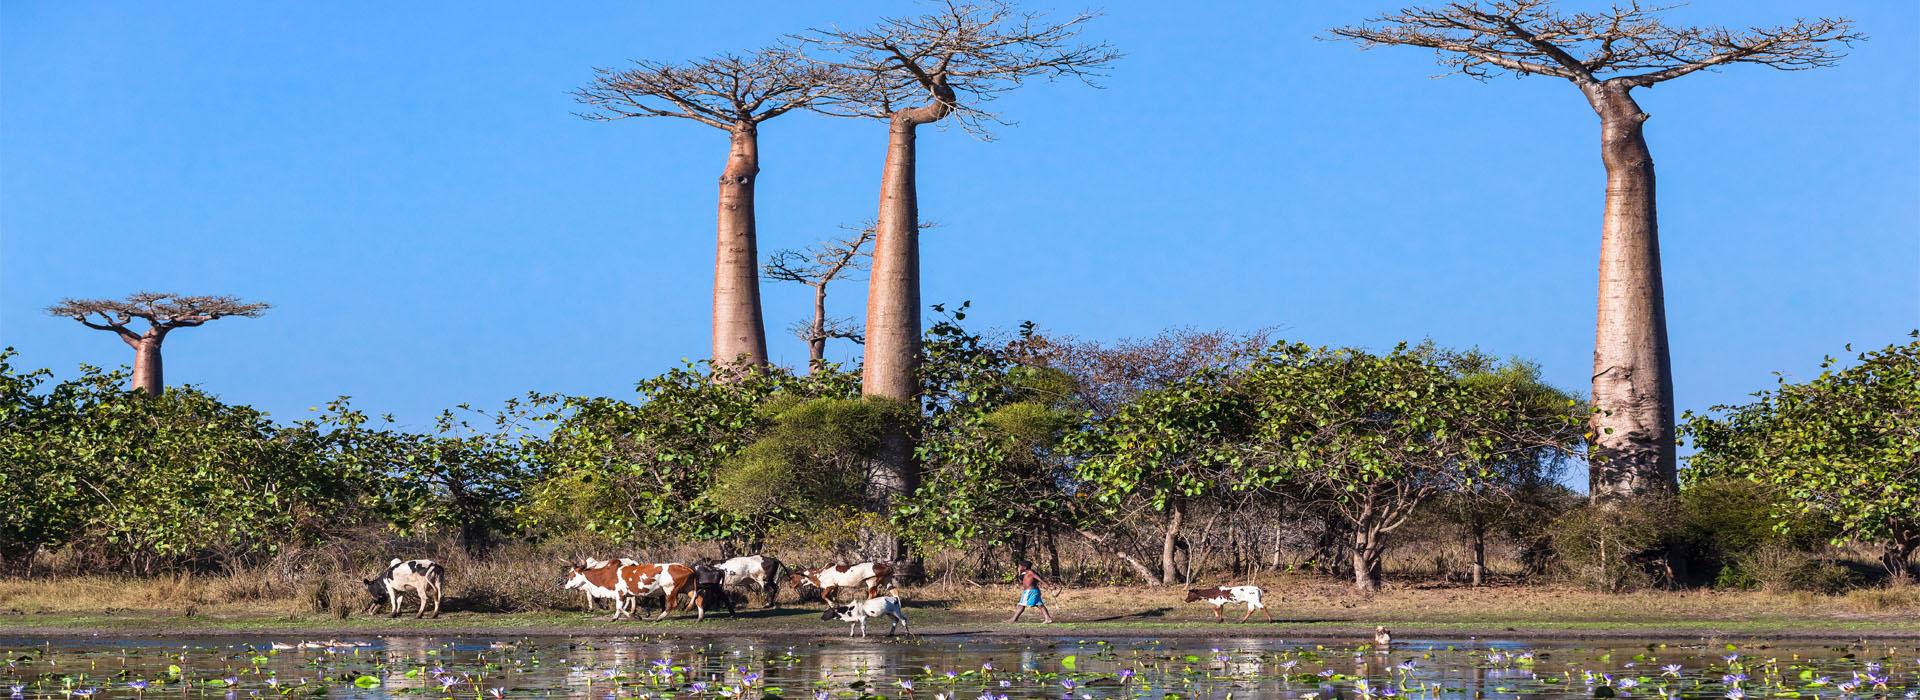 Morondava - Top Travel Destinations in Madagascar - Africa Adventure Specialists